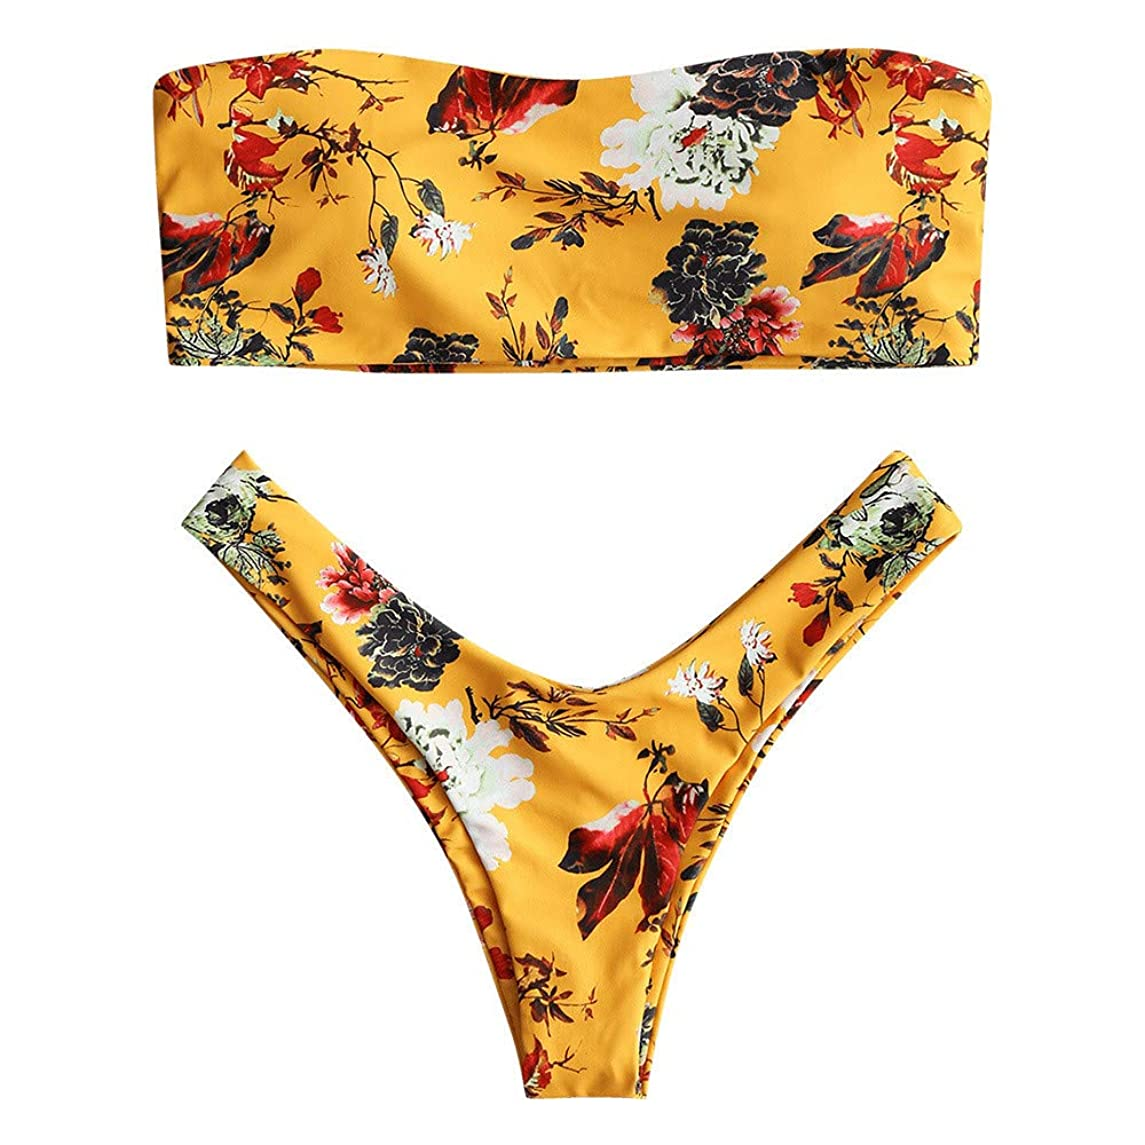 Women's Printed Tube Top Bikini Split Swimsuit Set Push-Up Off Shoulder Swimsuit Beachwear